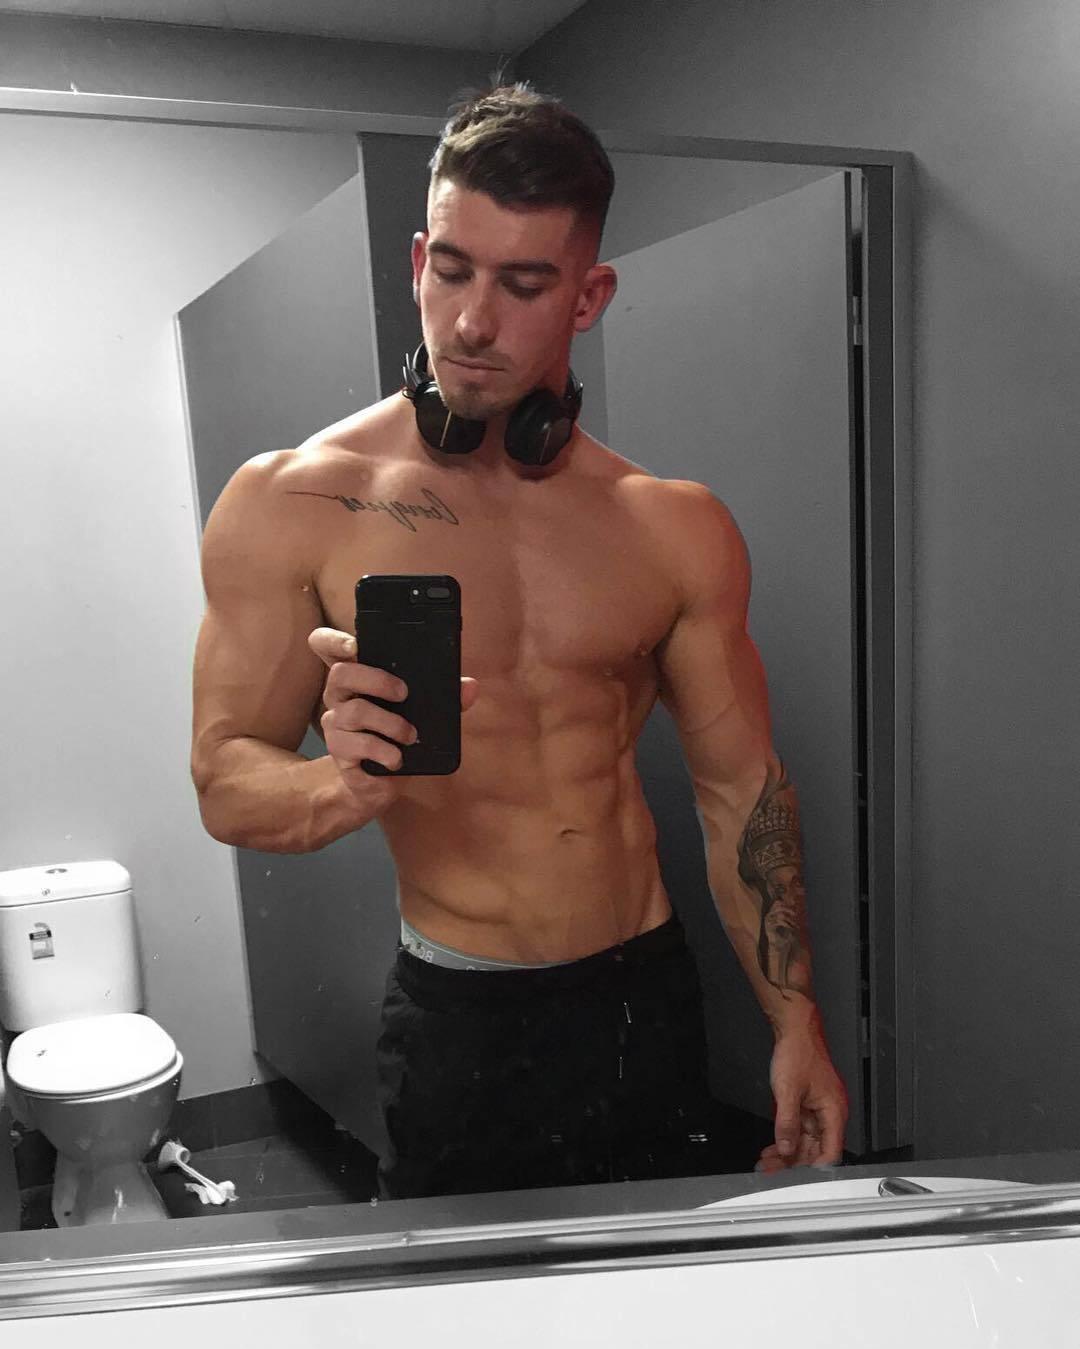 hot-shirtless-guys-broad-shoulders-blake-williamson-fit-body-selfie